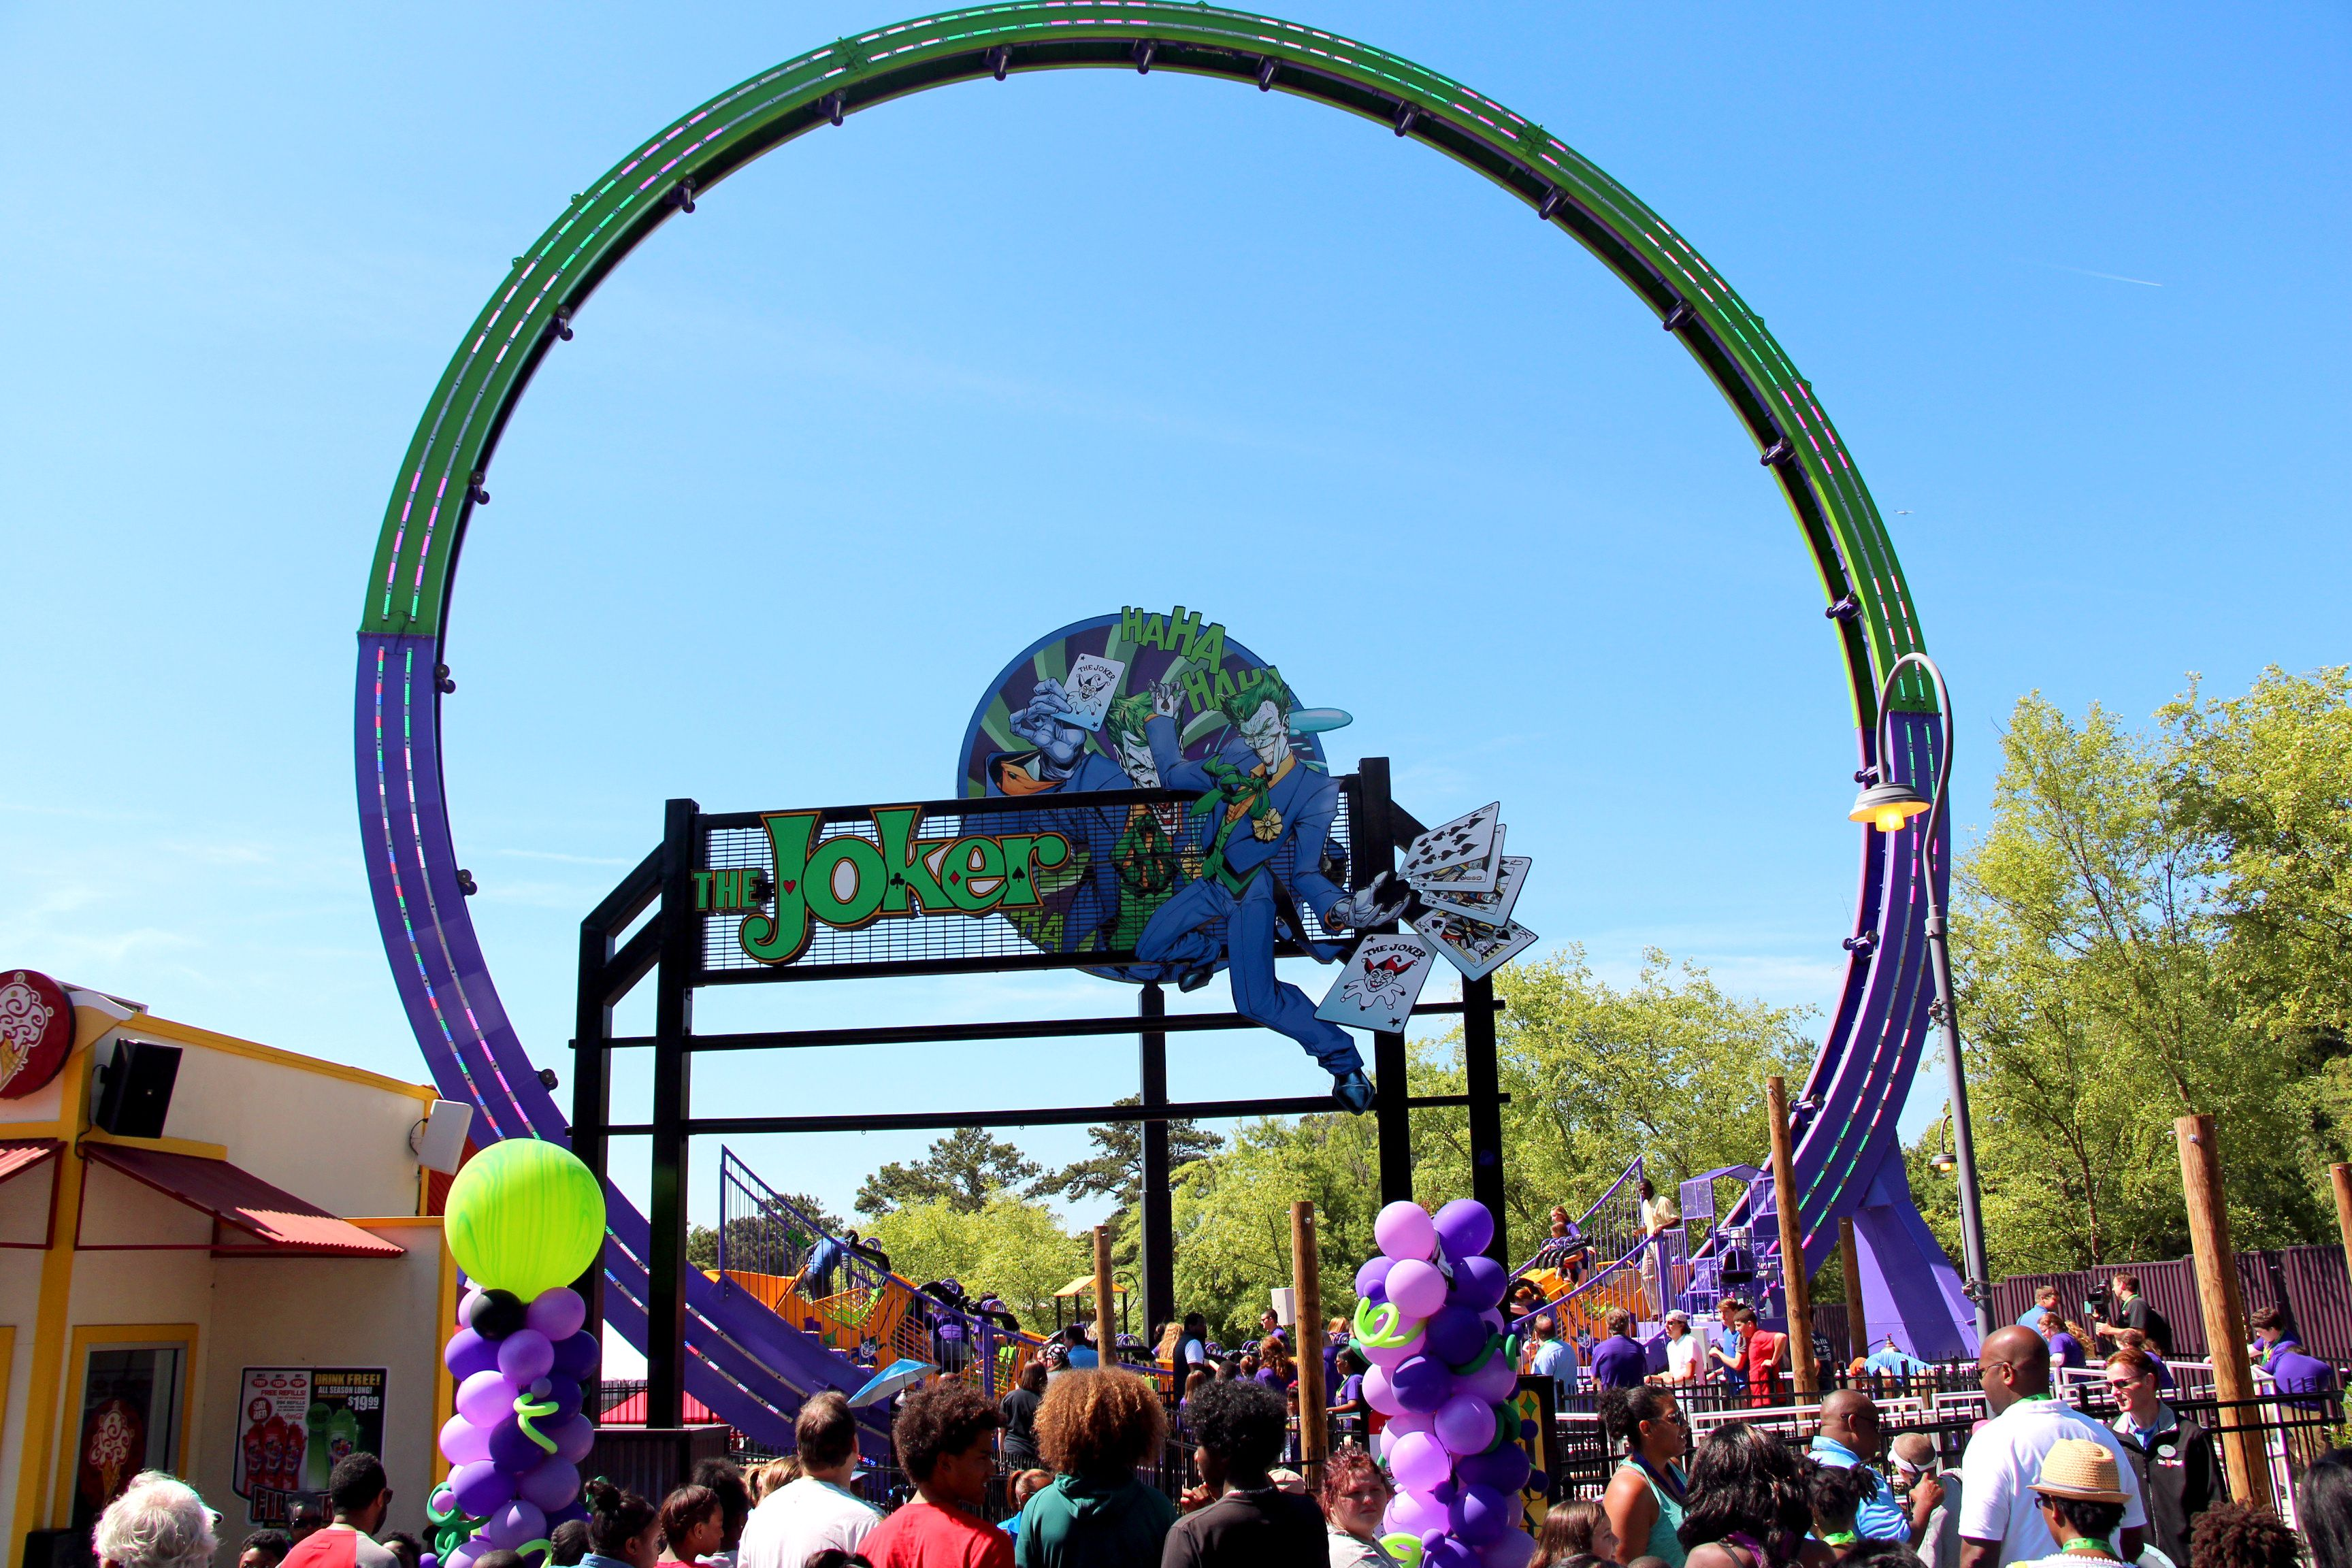 Video The Joker Chaos Coaster Full Ride Pov At Six Flags Over Georgia Theme Park Hq Six Flags Six Flags Season Pass Theme Park